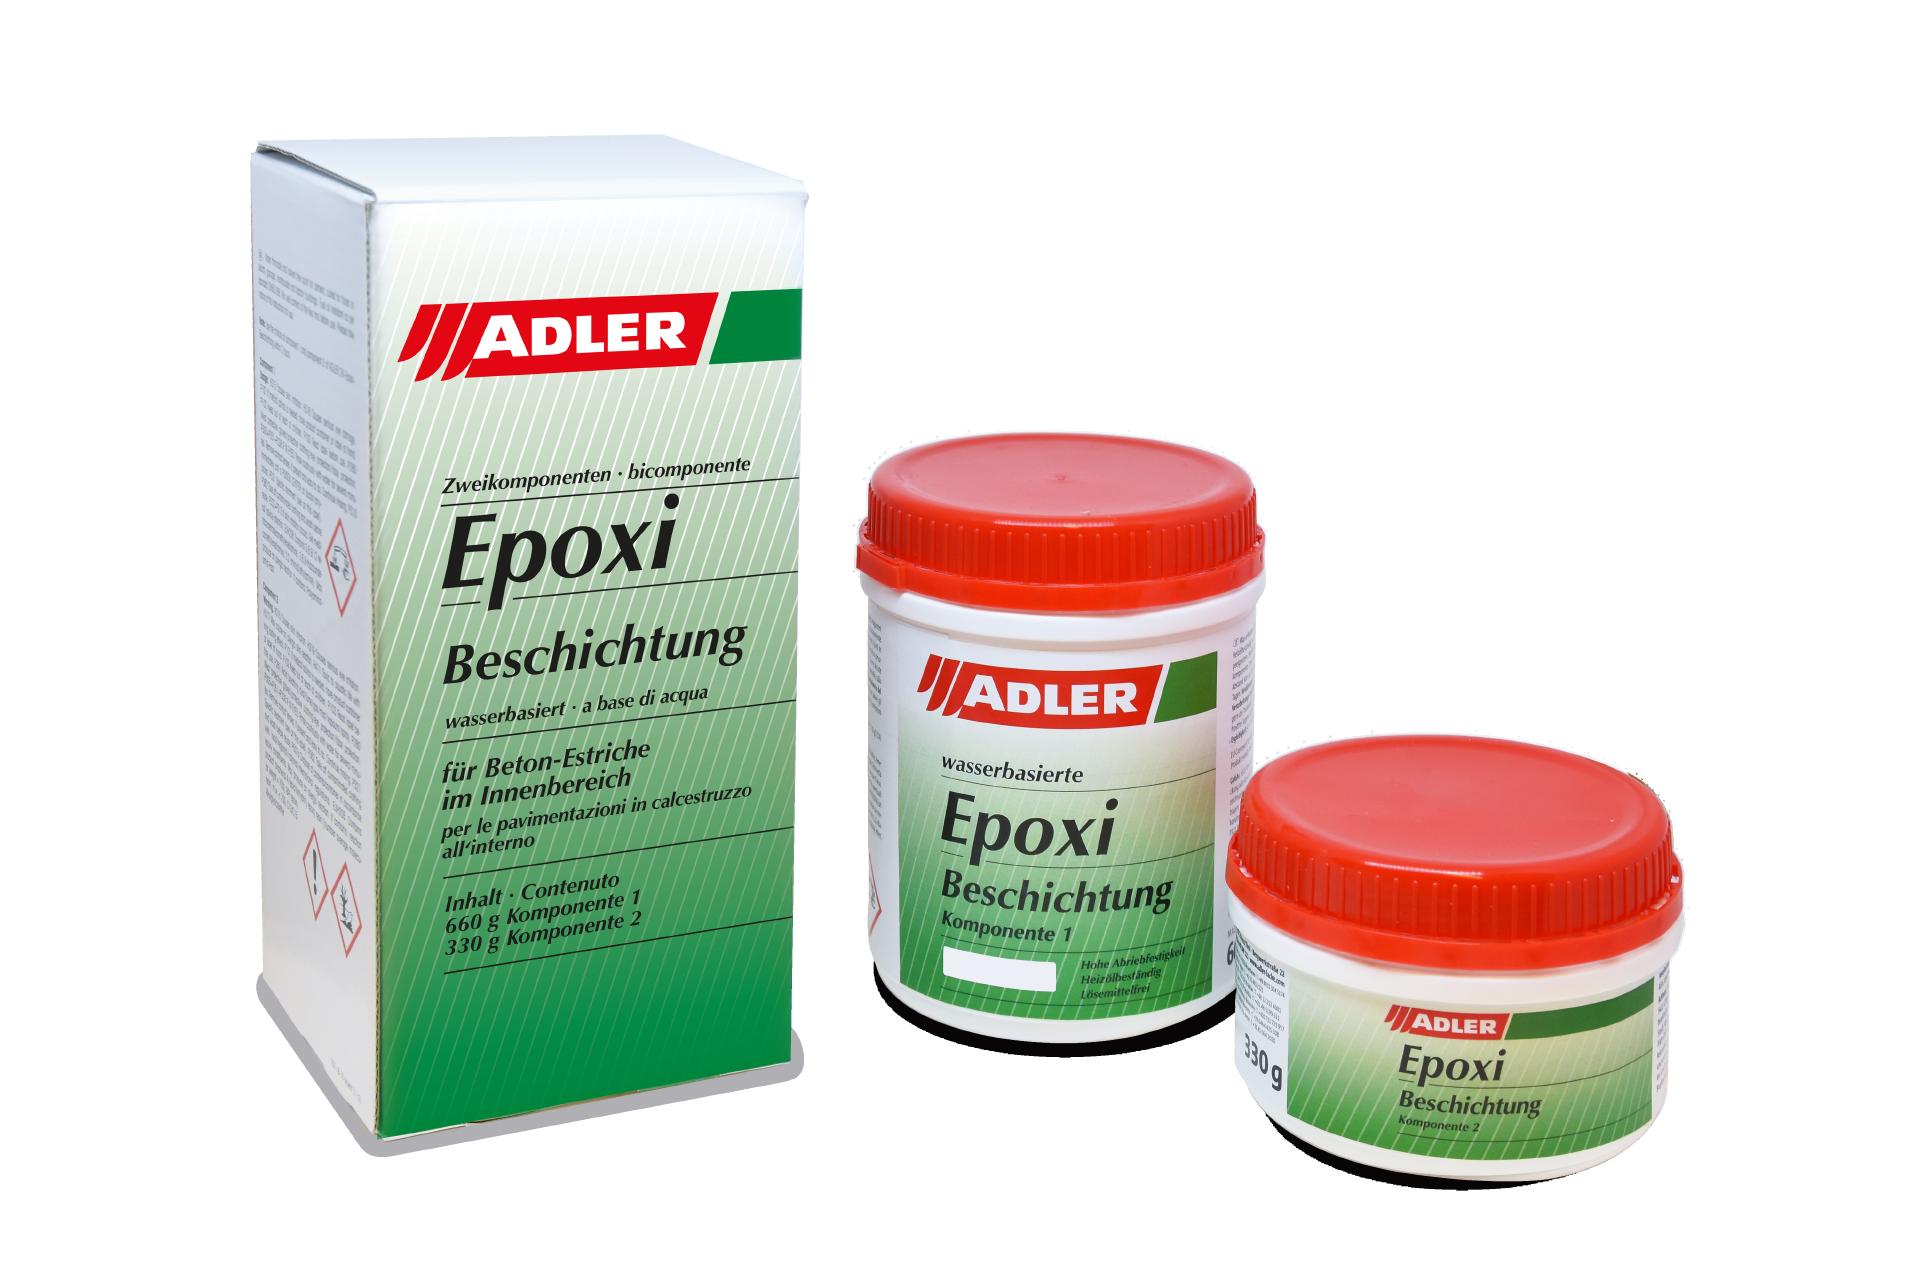 2K-Epoxi-Beschichtung Betongrau, Komponente I 1kg